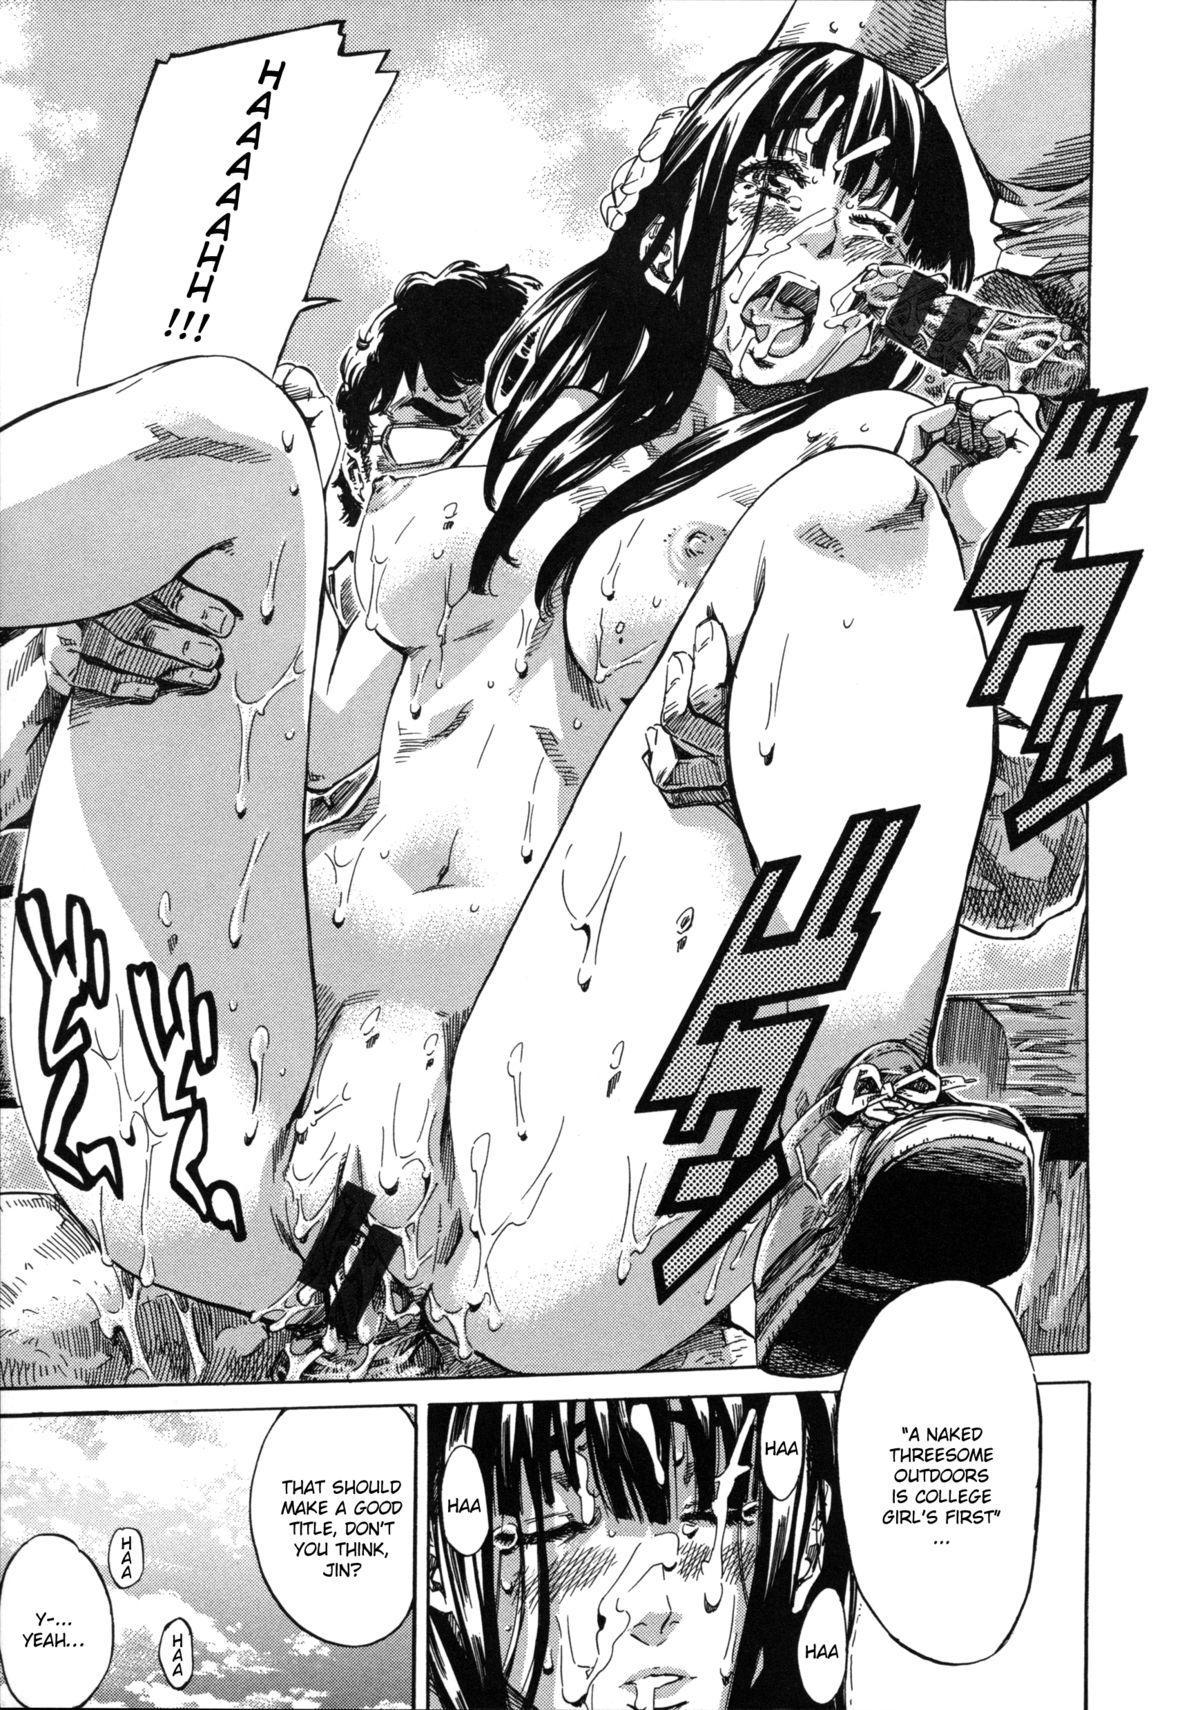 Kashiwazaki Miki wa Ironna Basho de Zenra Sanpo Shitemita | Miki Kashiwazaki Goes Naked in All Sorts of Places 169